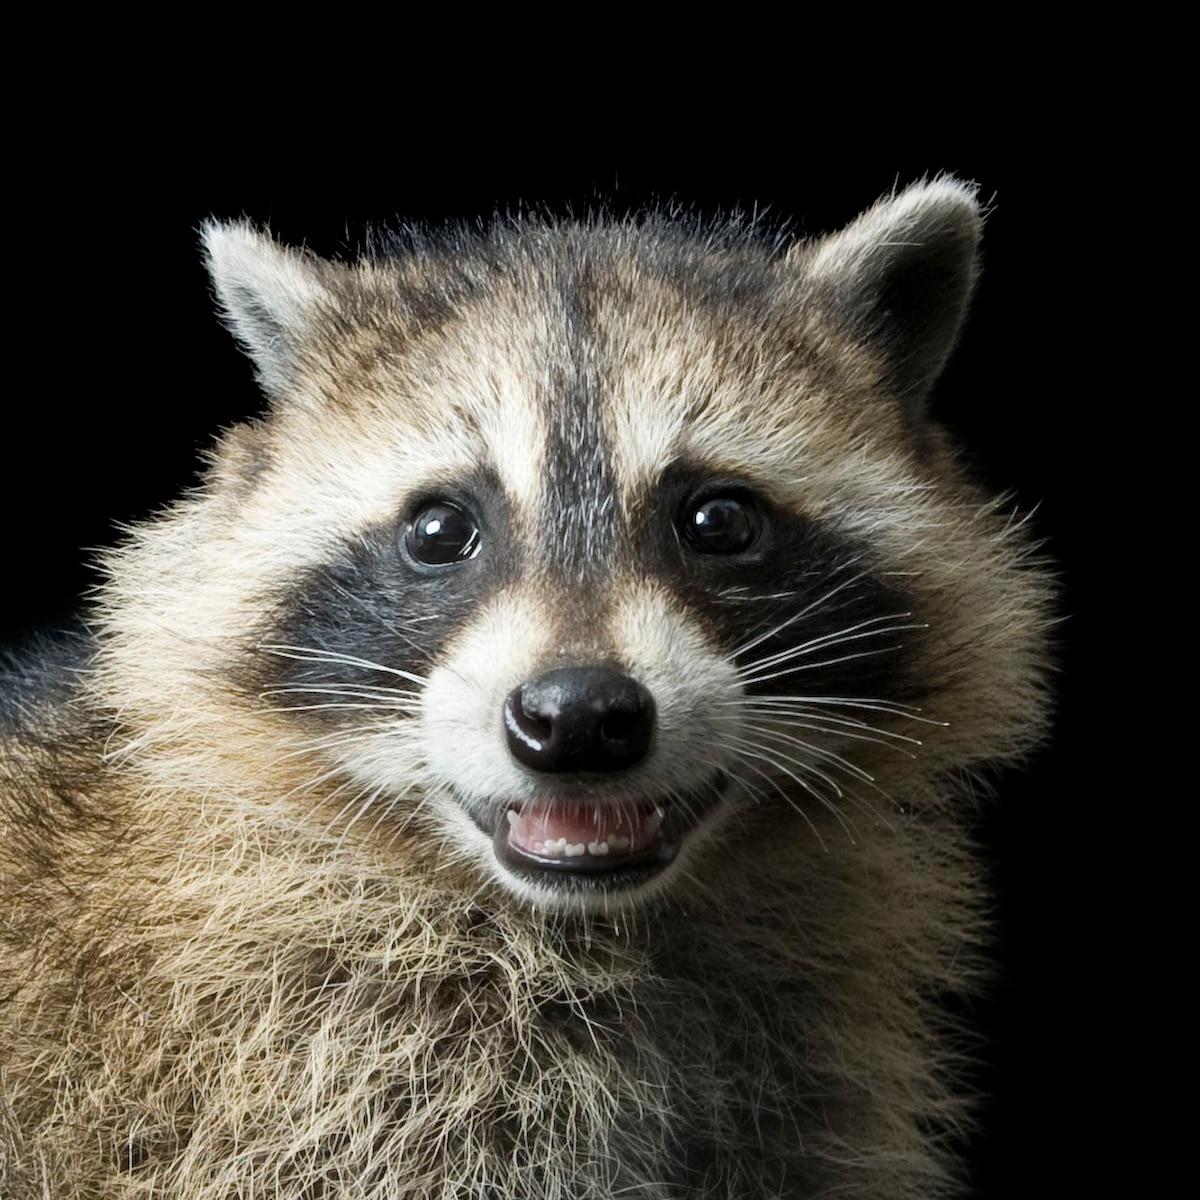 Raccoon | National Geographic